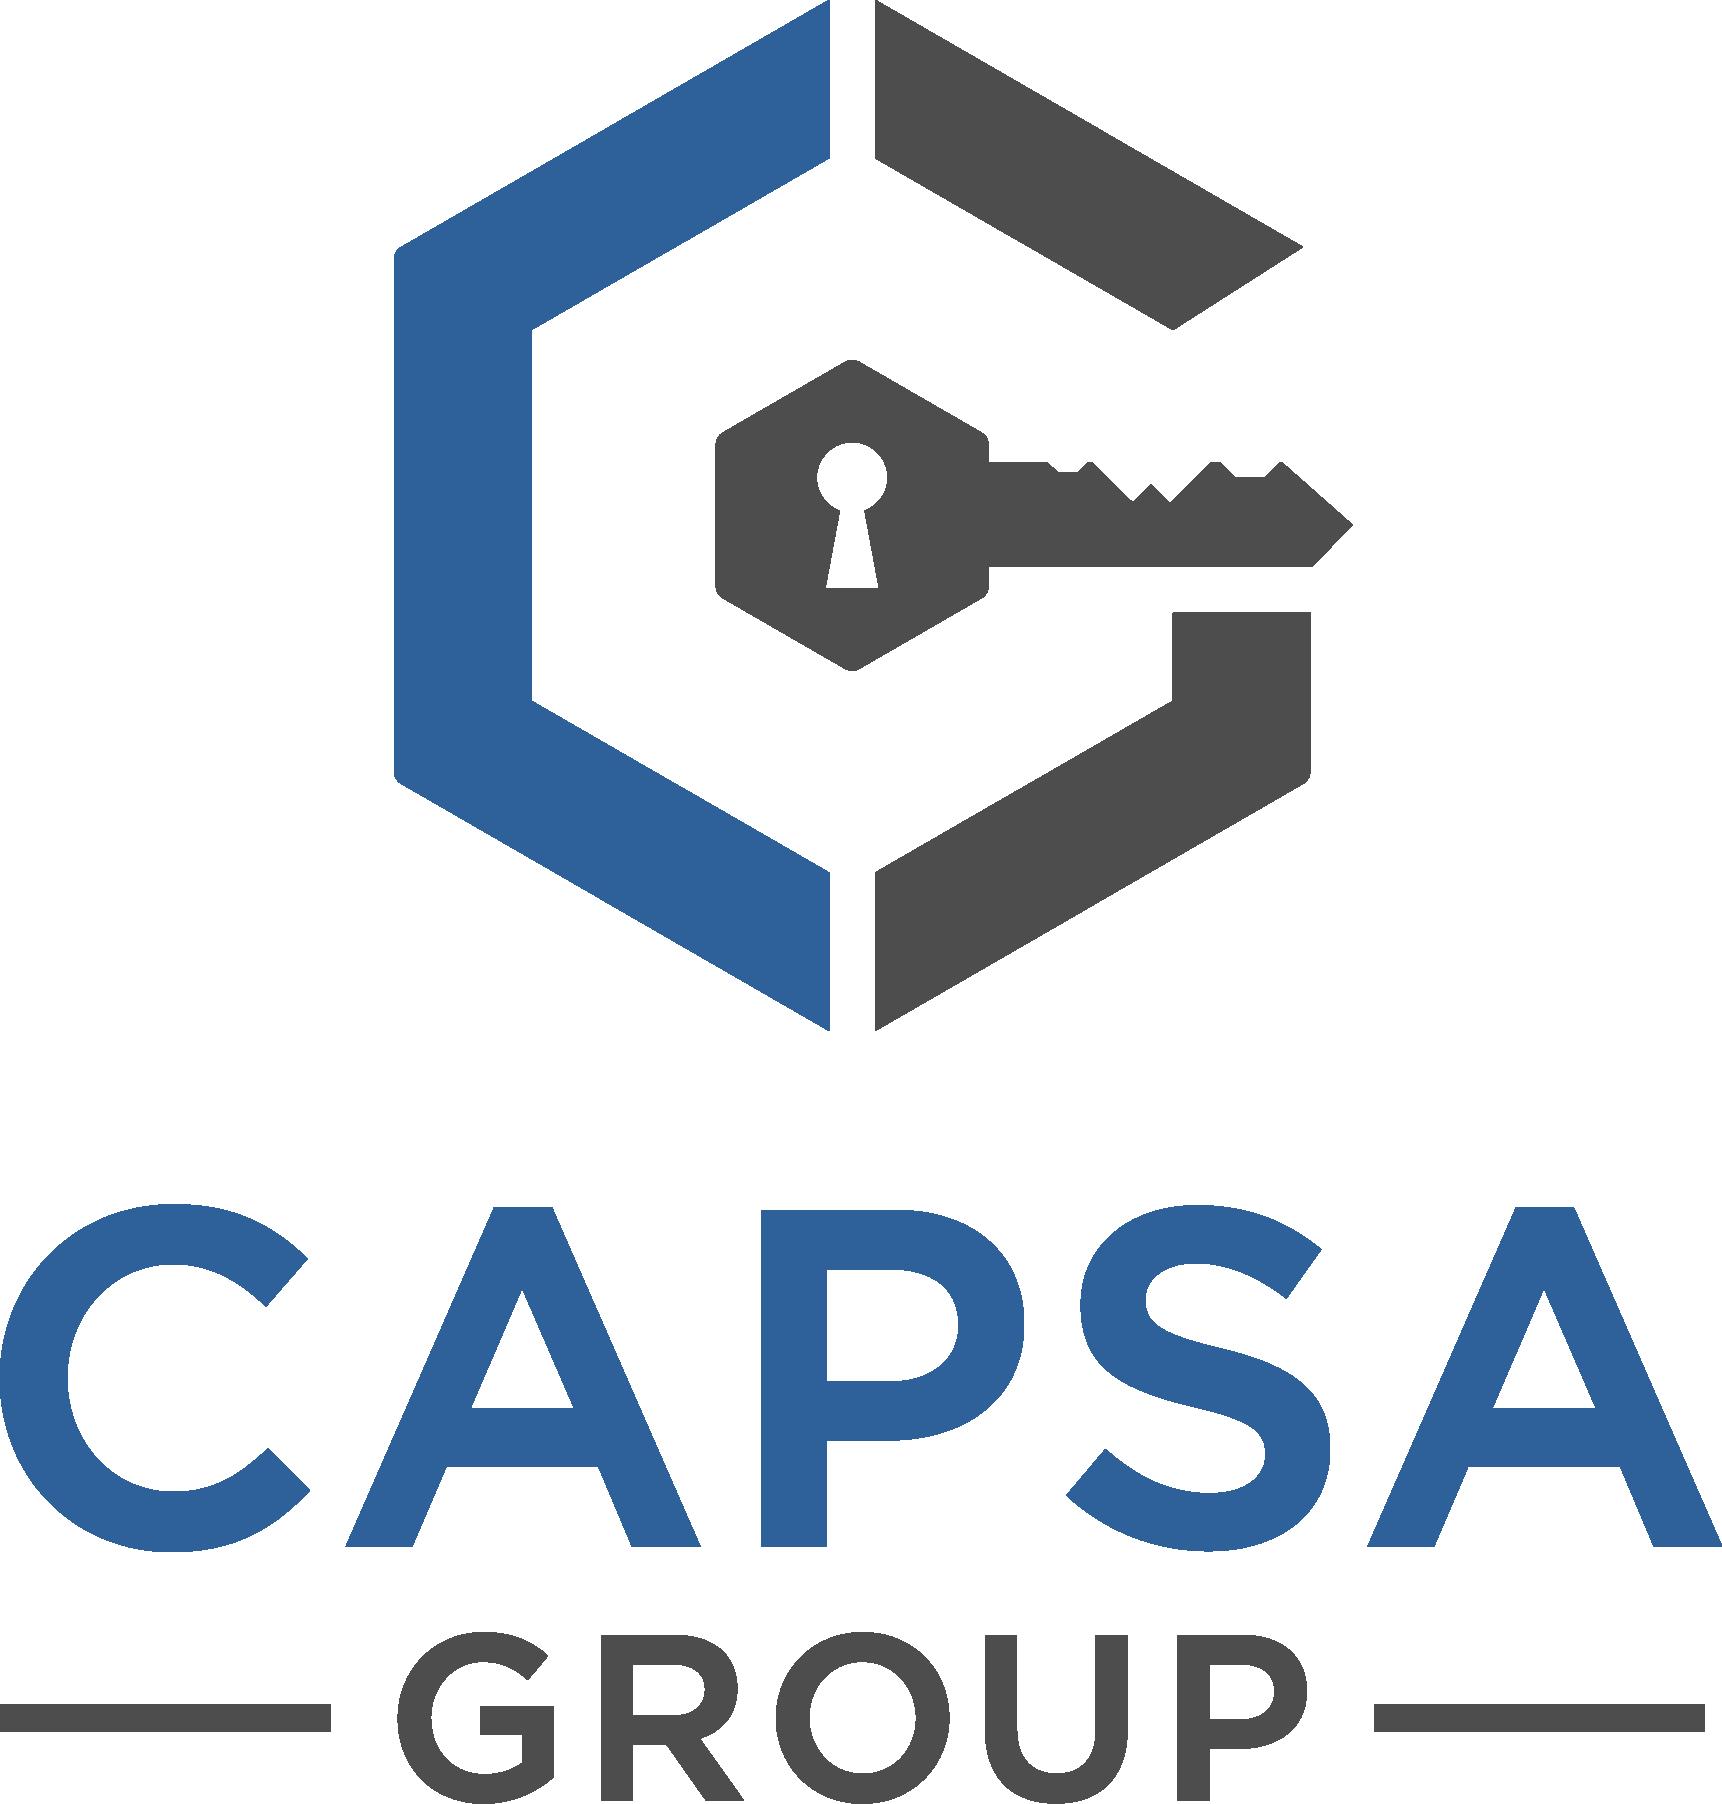 Capsa Group (Transparent).png